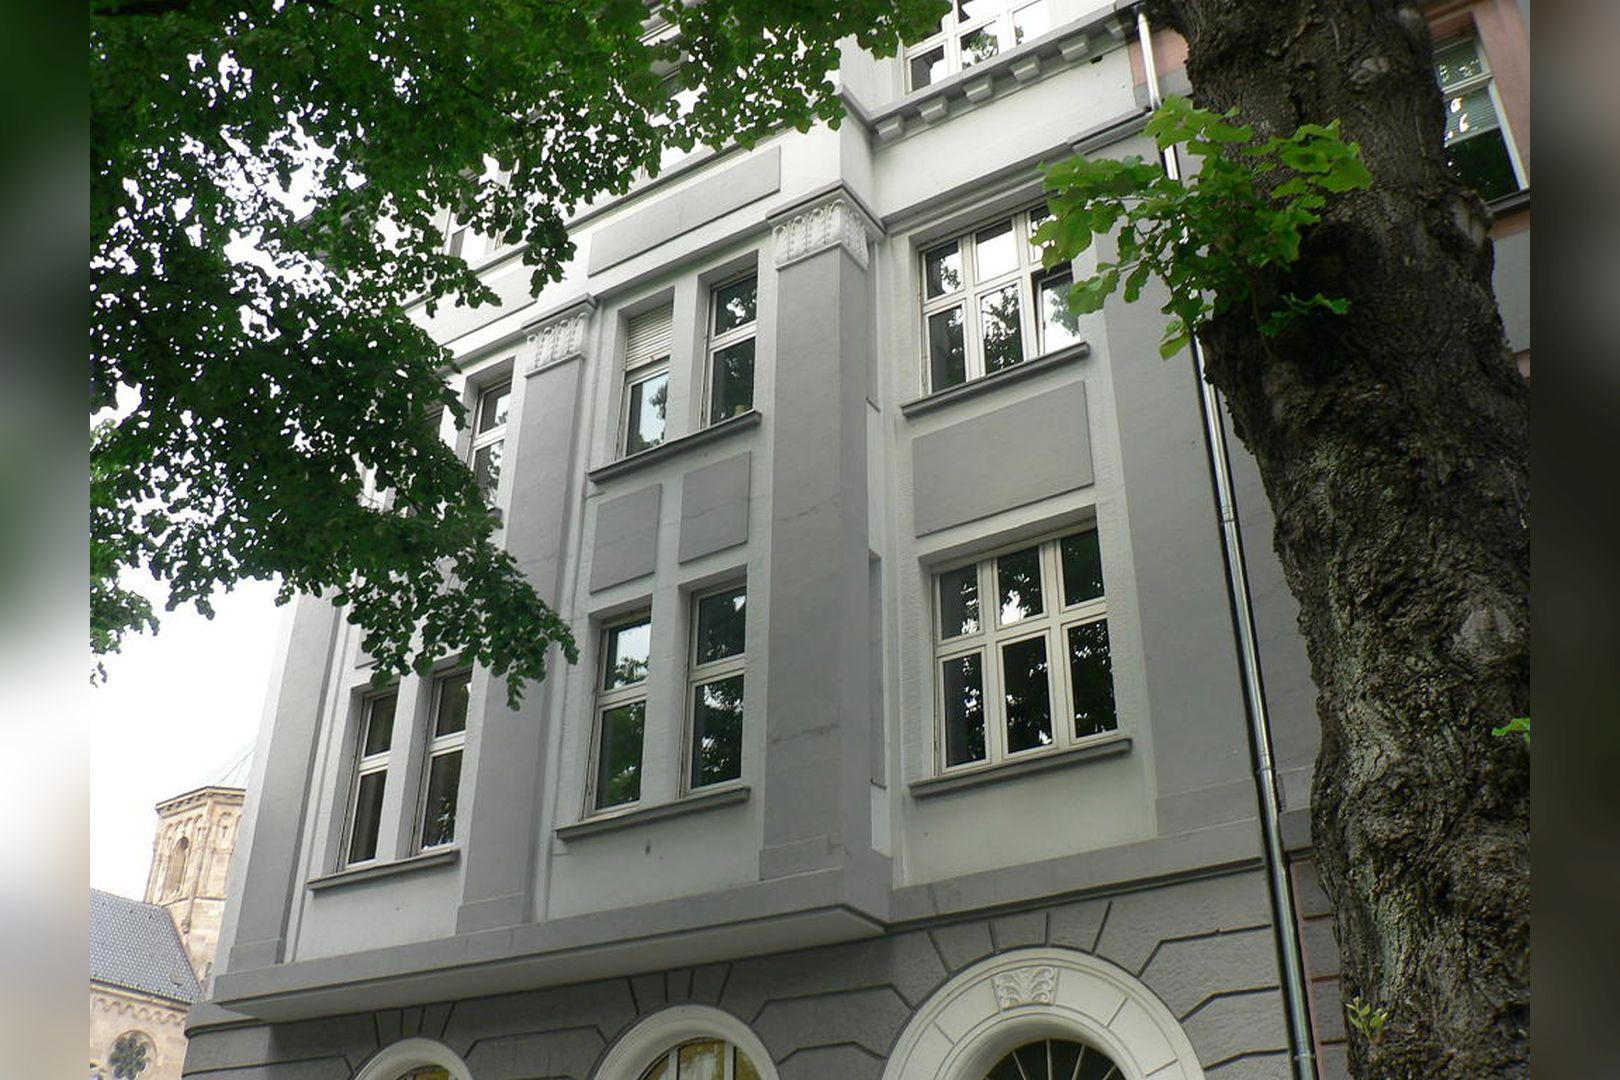 Immobilie Nr.114 - Bürofläche im Altbauobjekt - Bild 2.jpg